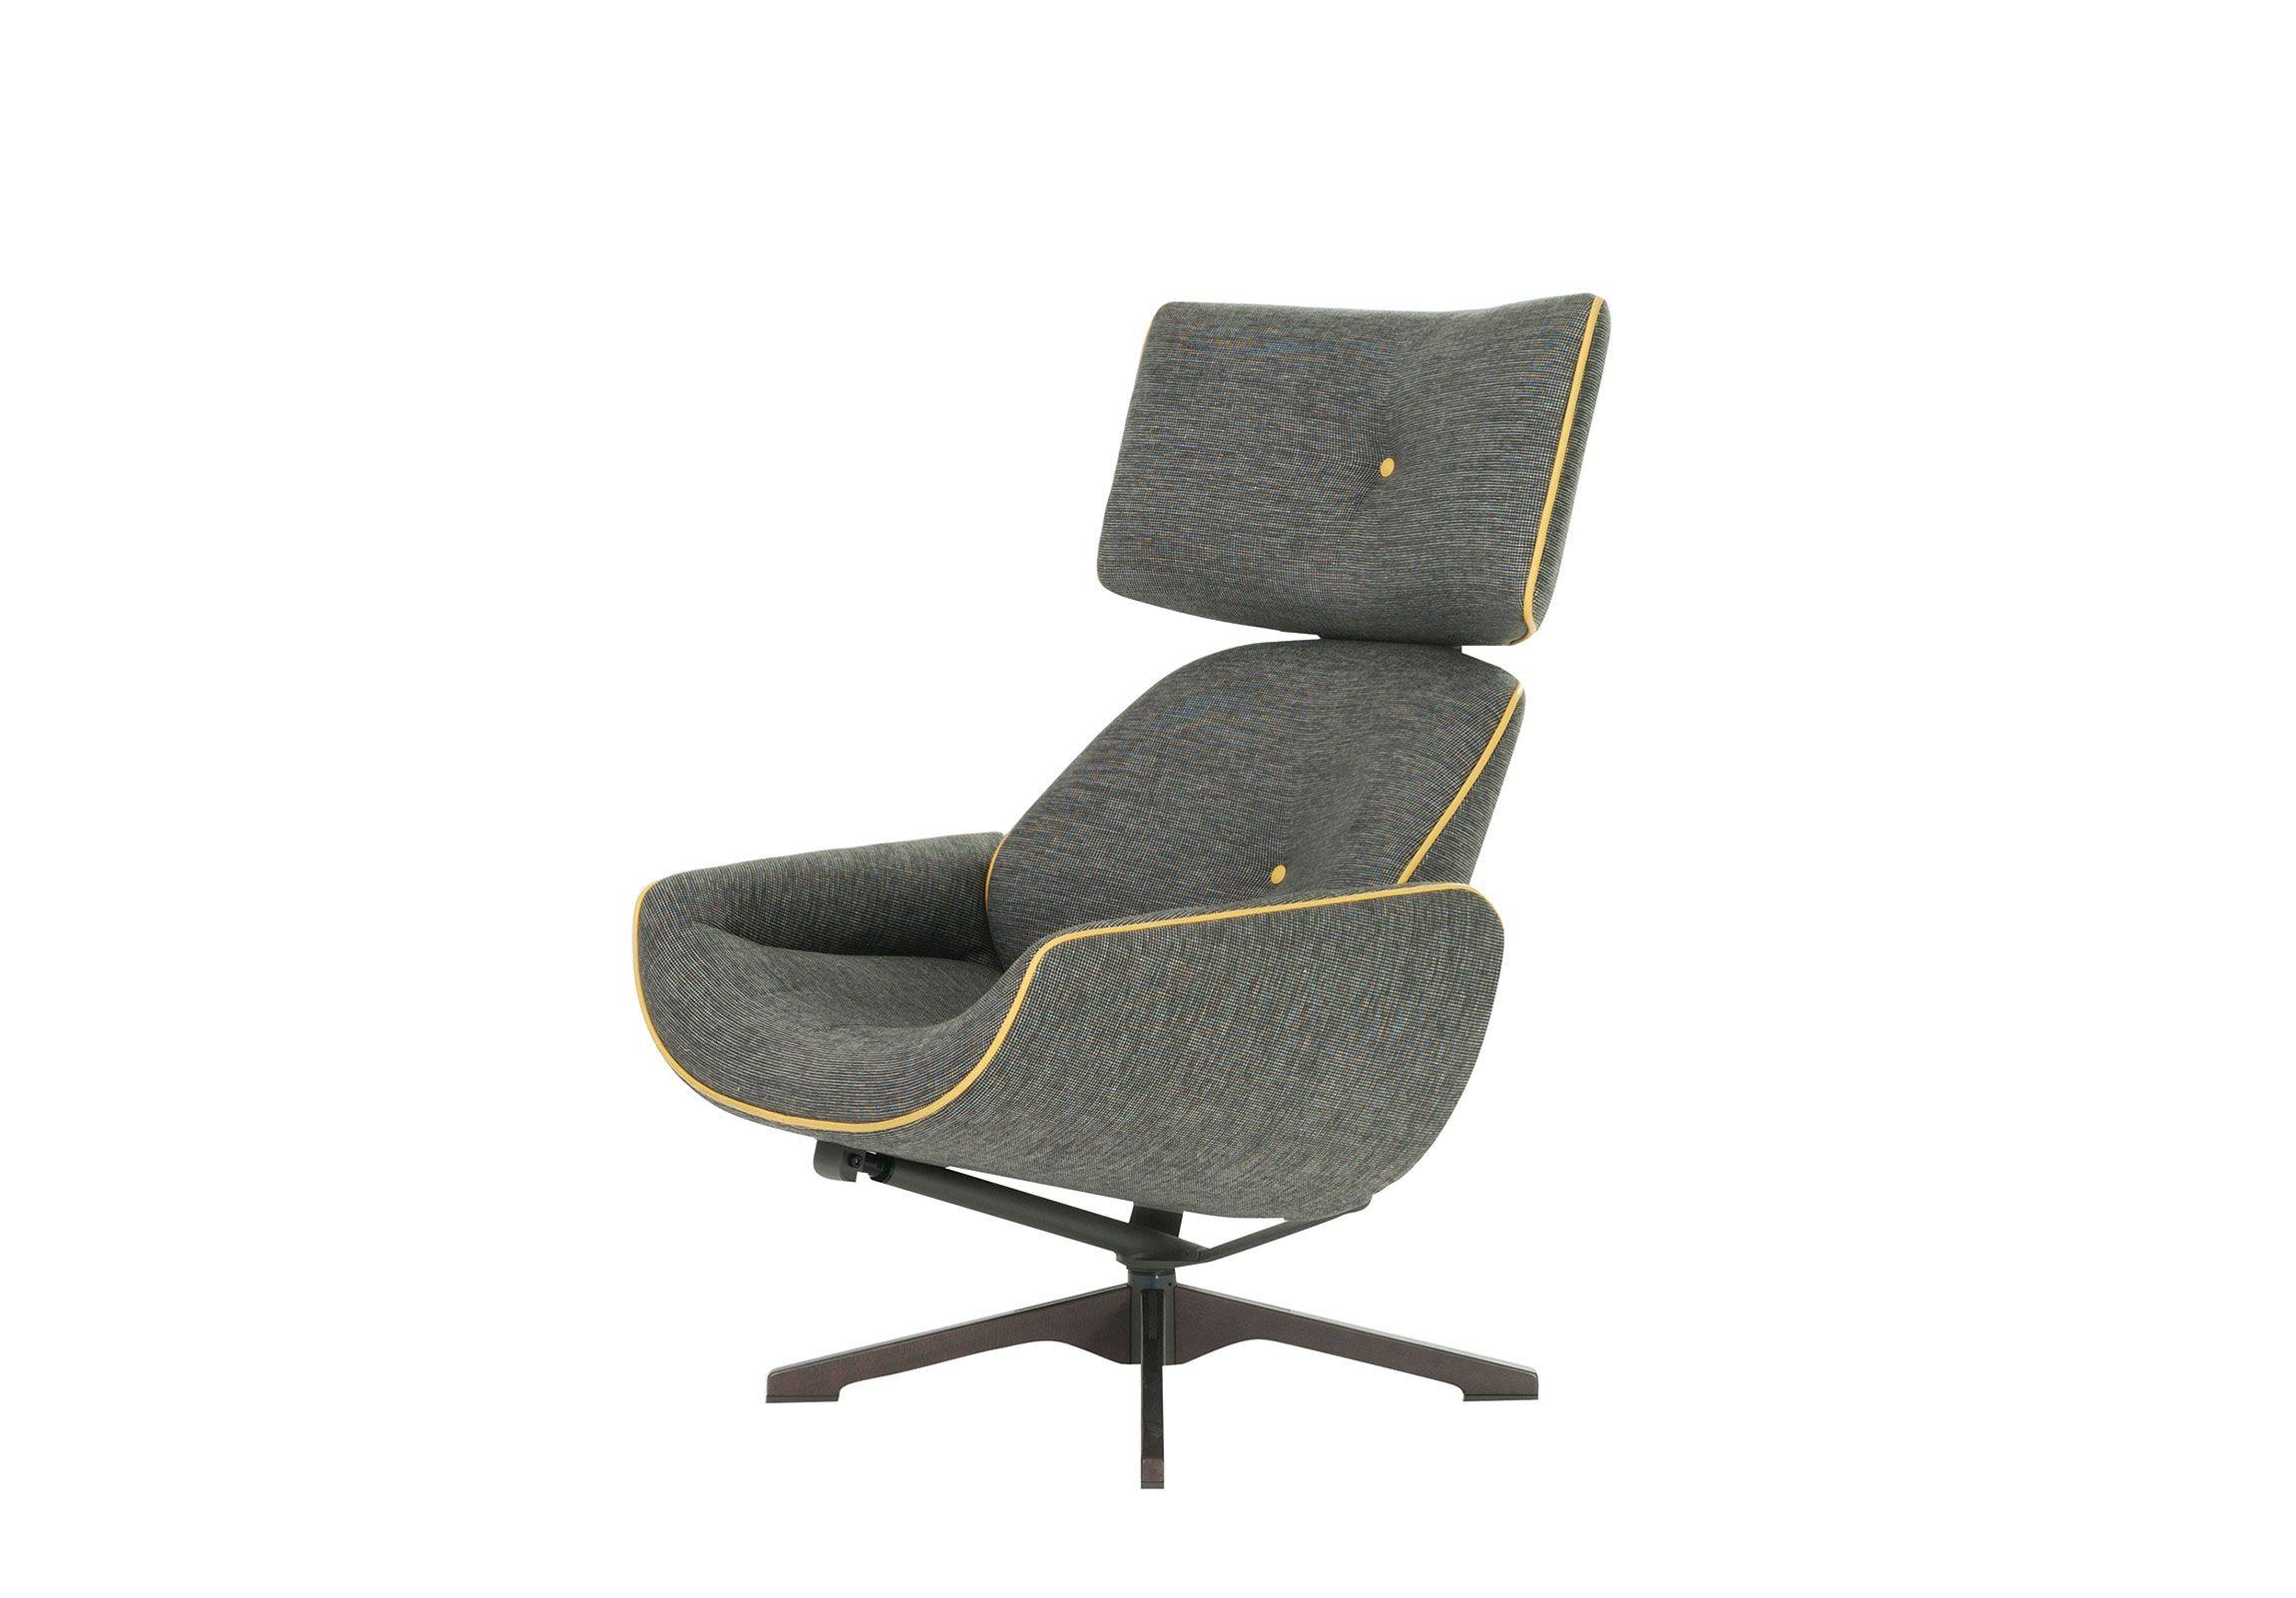 Miraculous So Quiet Armchair Roche Bobois In 2019 Chair Mcm Bralicious Painted Fabric Chair Ideas Braliciousco